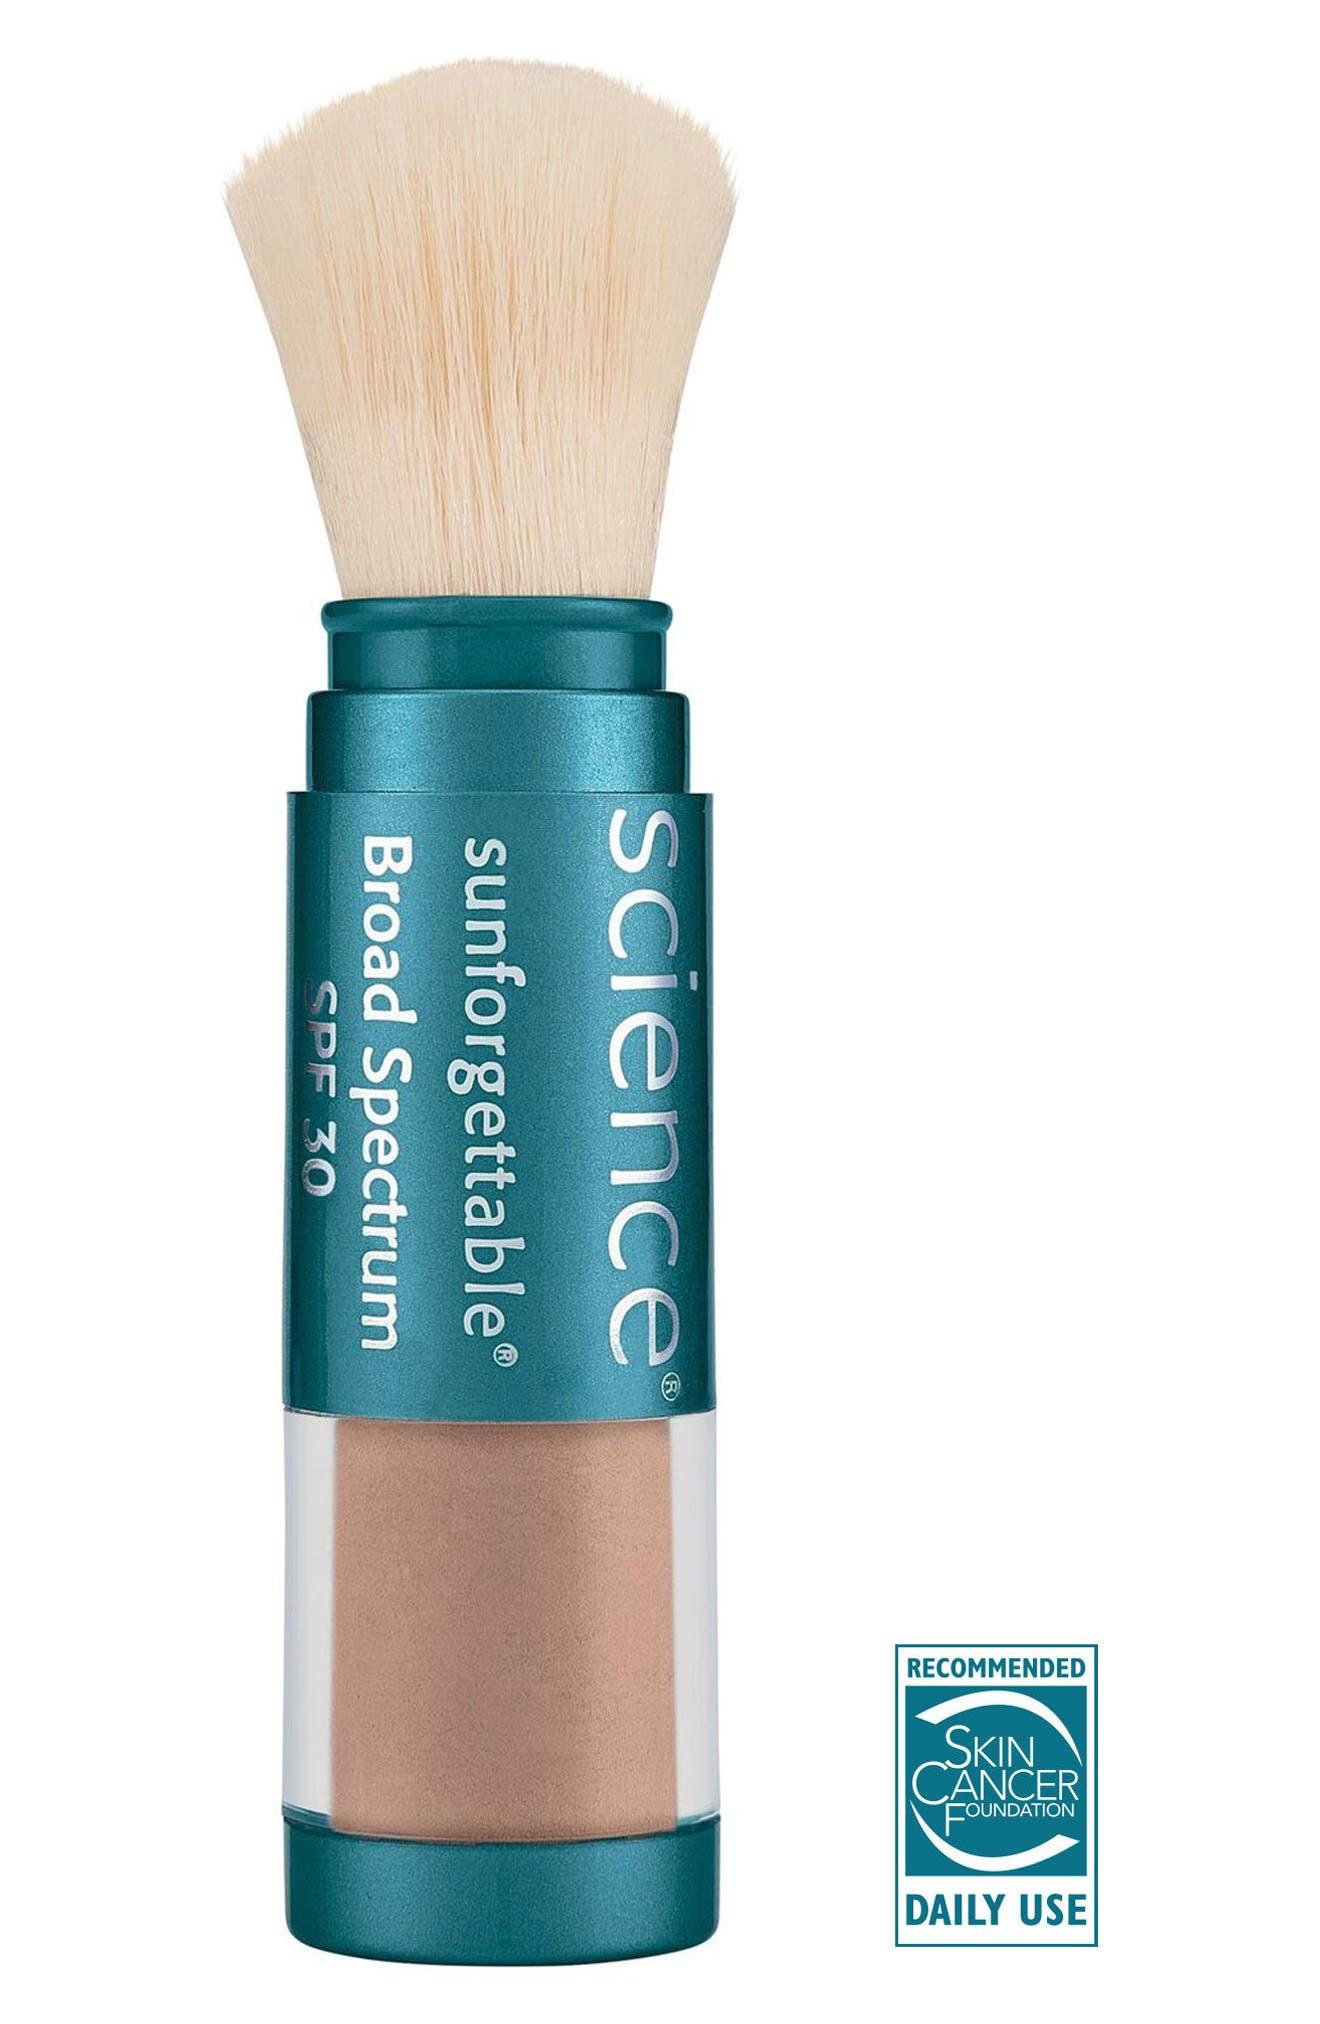 Colorescience Sunforgettable Brush-On Sunscreen Spf 30